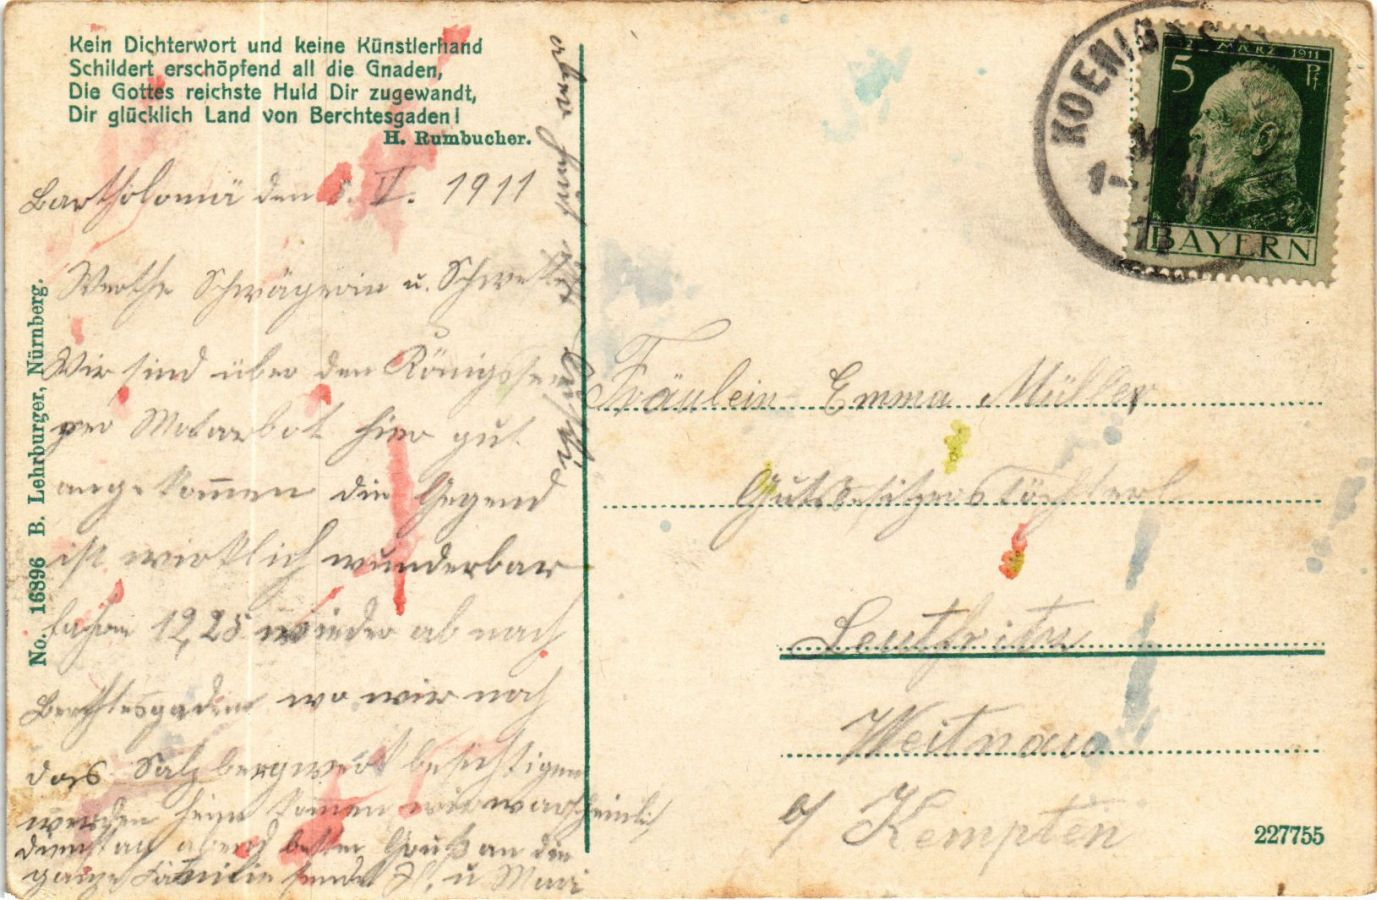 CPA-AK-Konigssee-St-Bartholoma-GERMANY-878820 miniature 2